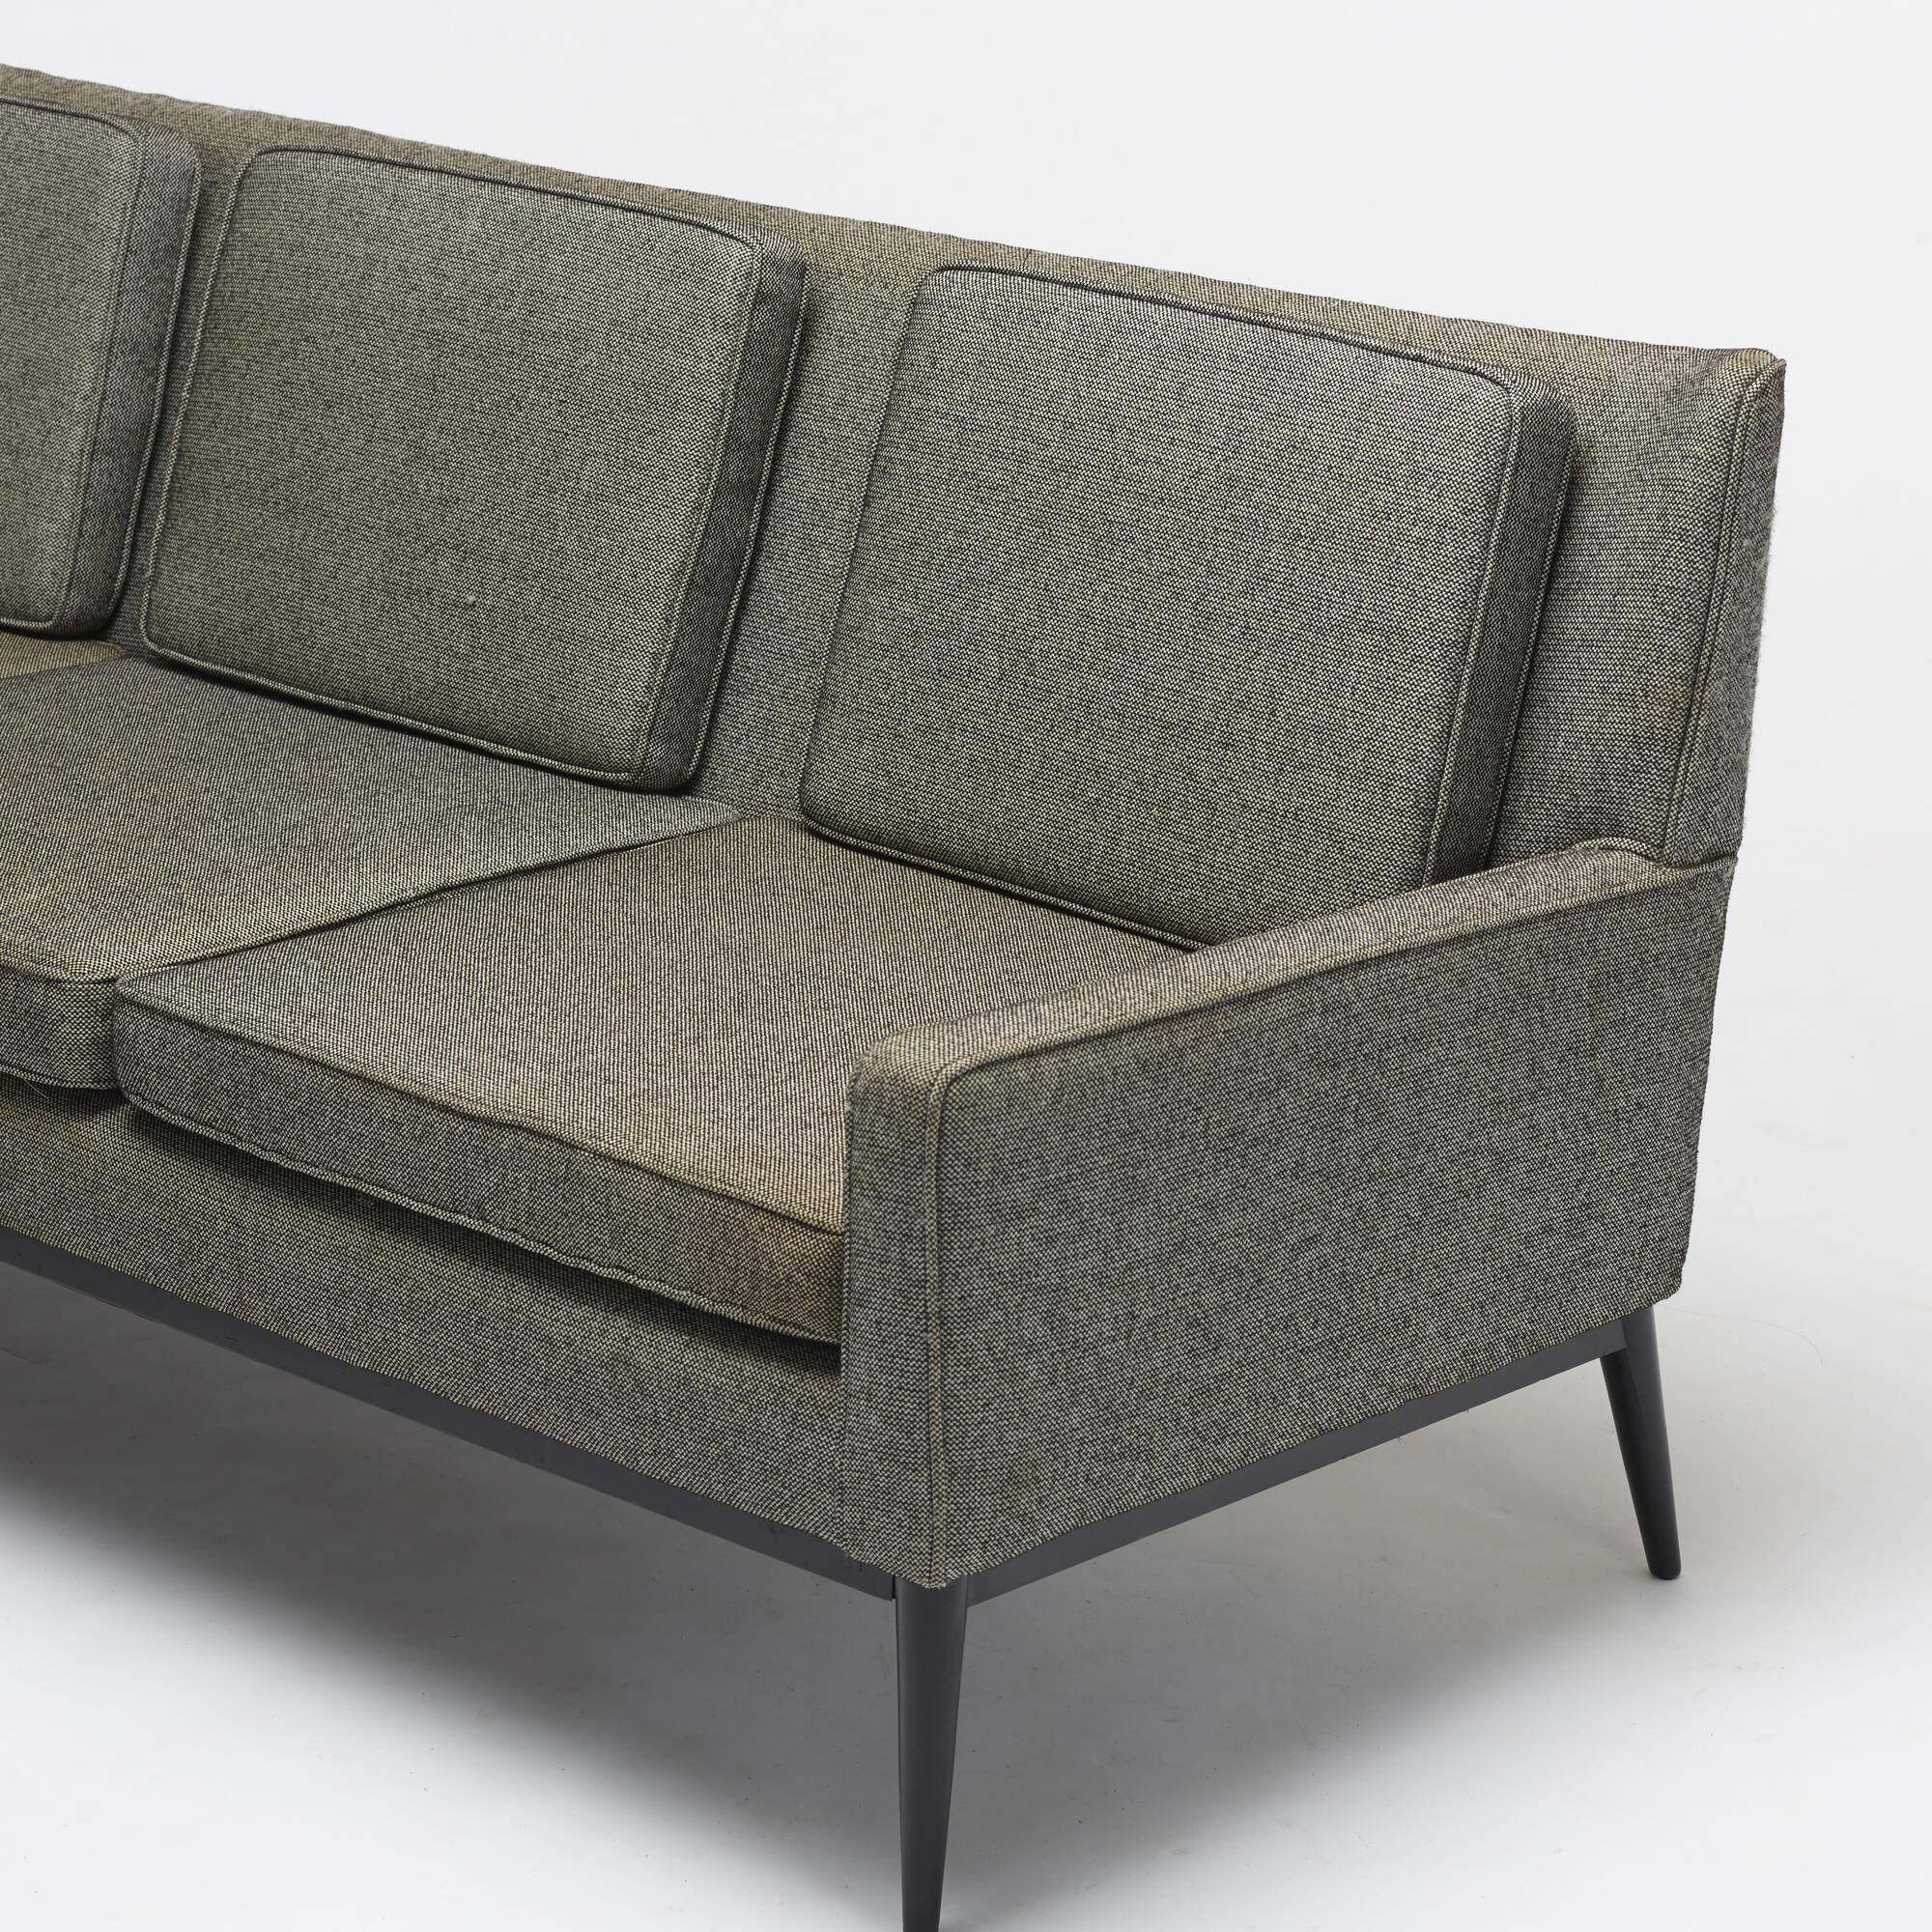 557: Paul McCobb / sofa (3 of 3)